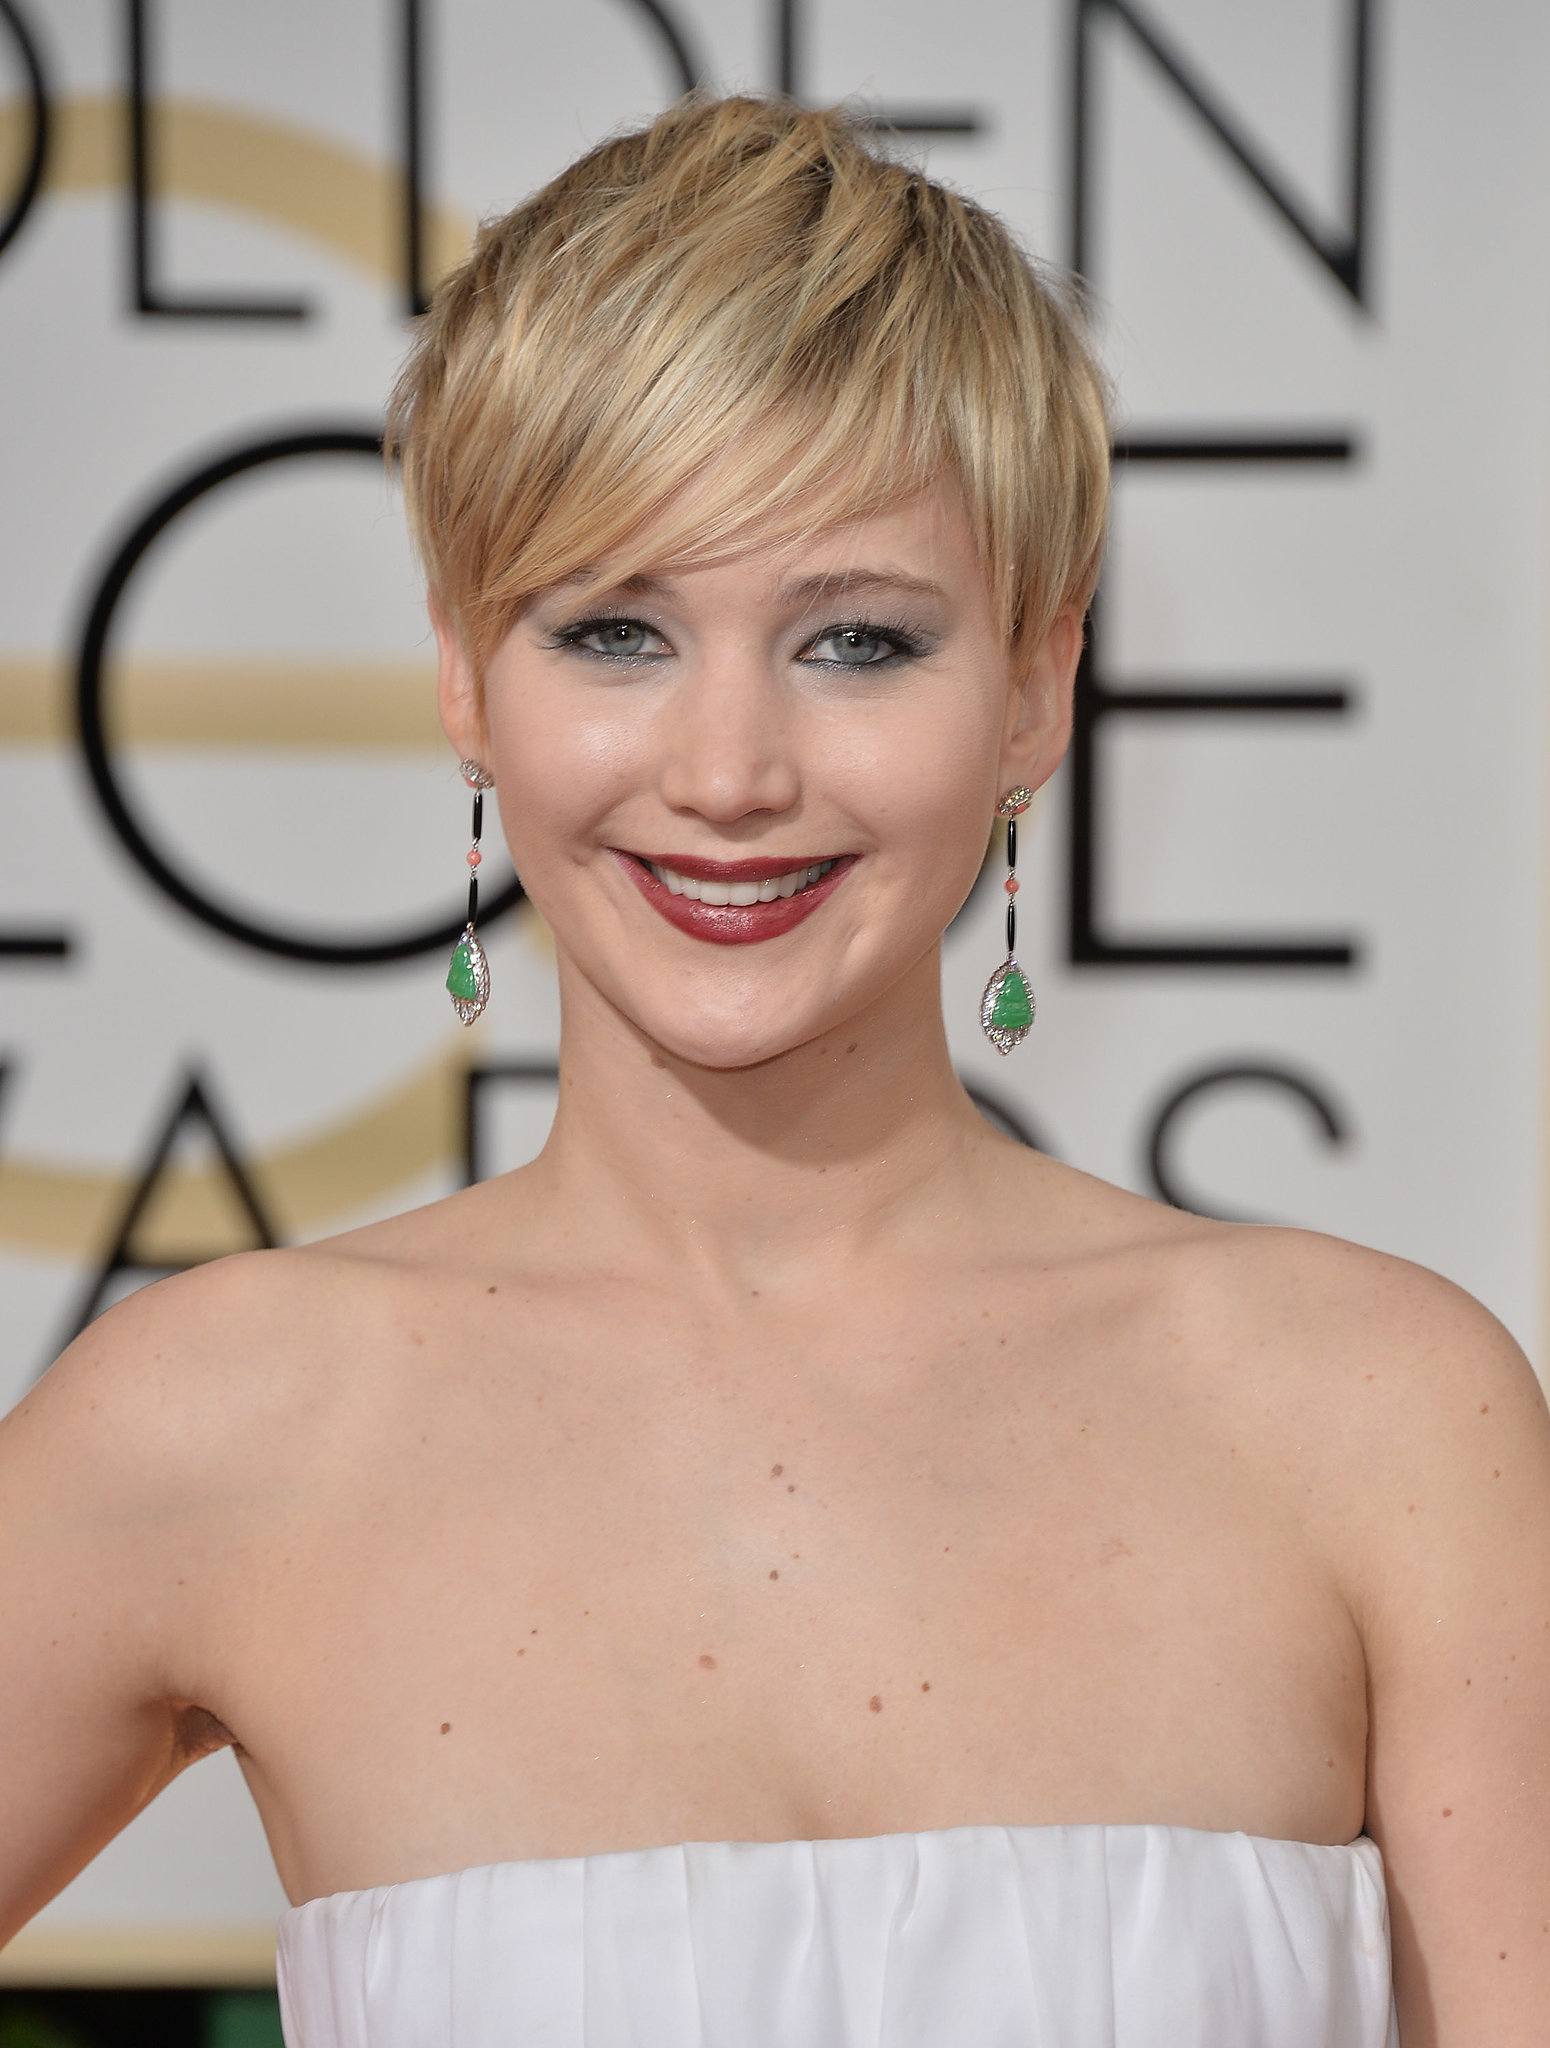 Jennifer Lawrence's Classic Pixie